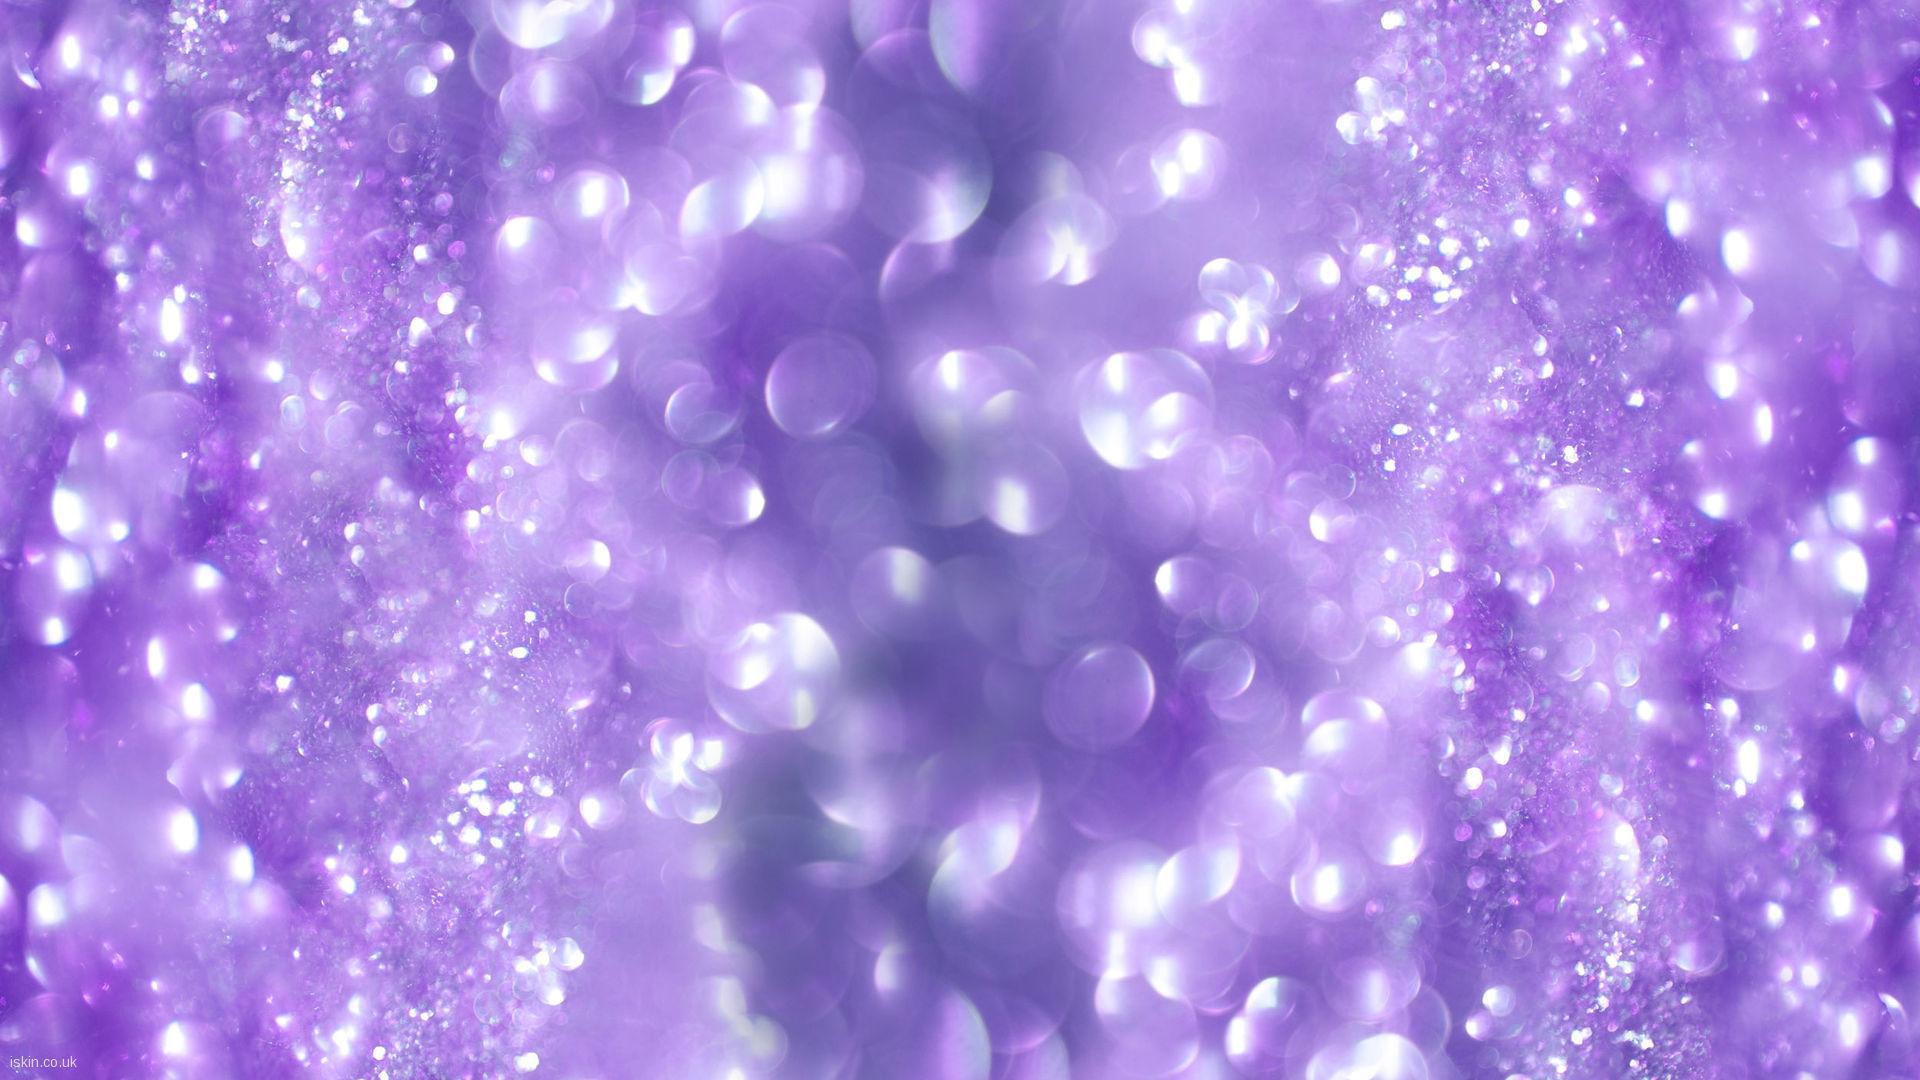 Glitter Wallpaper for Walls UK   Download HD Wallpapers